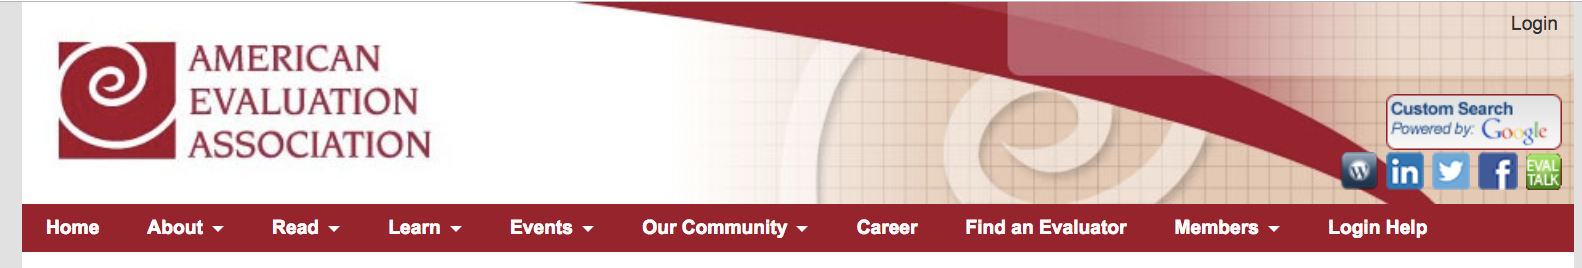 AEA website home page menu items